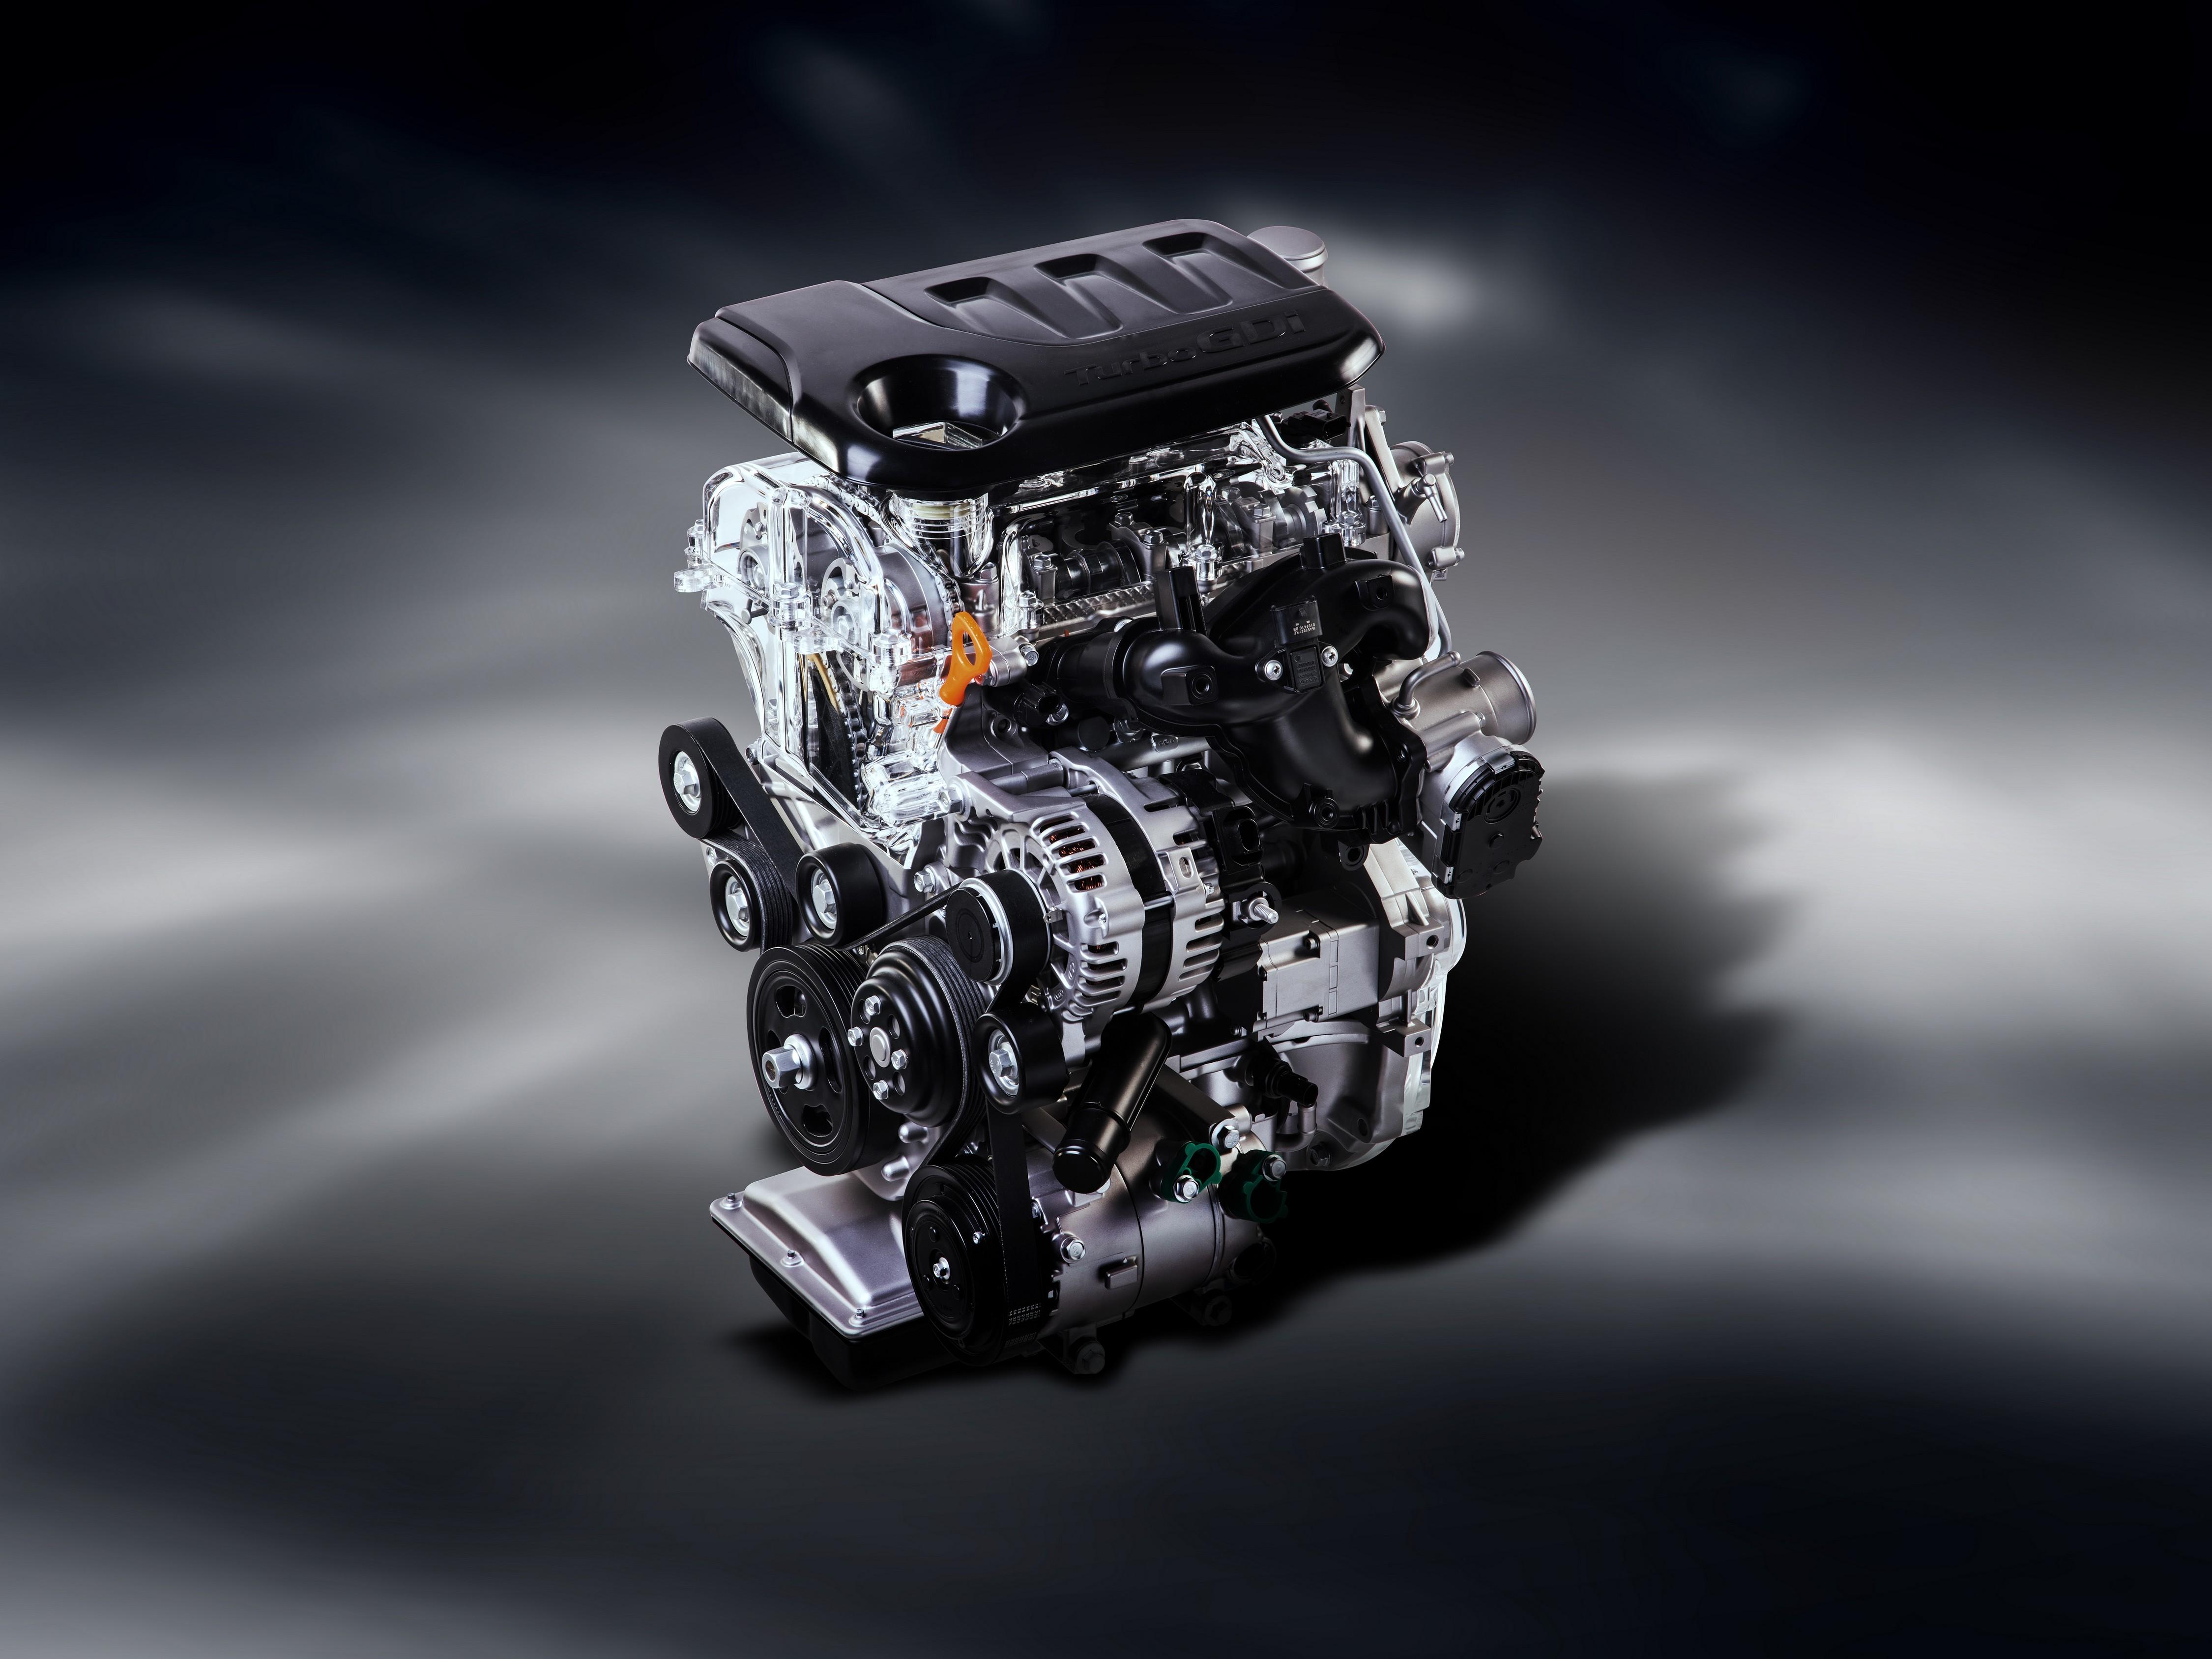 Kia Kappa Turbo 1.0-liter 120 hp Engine Revealed